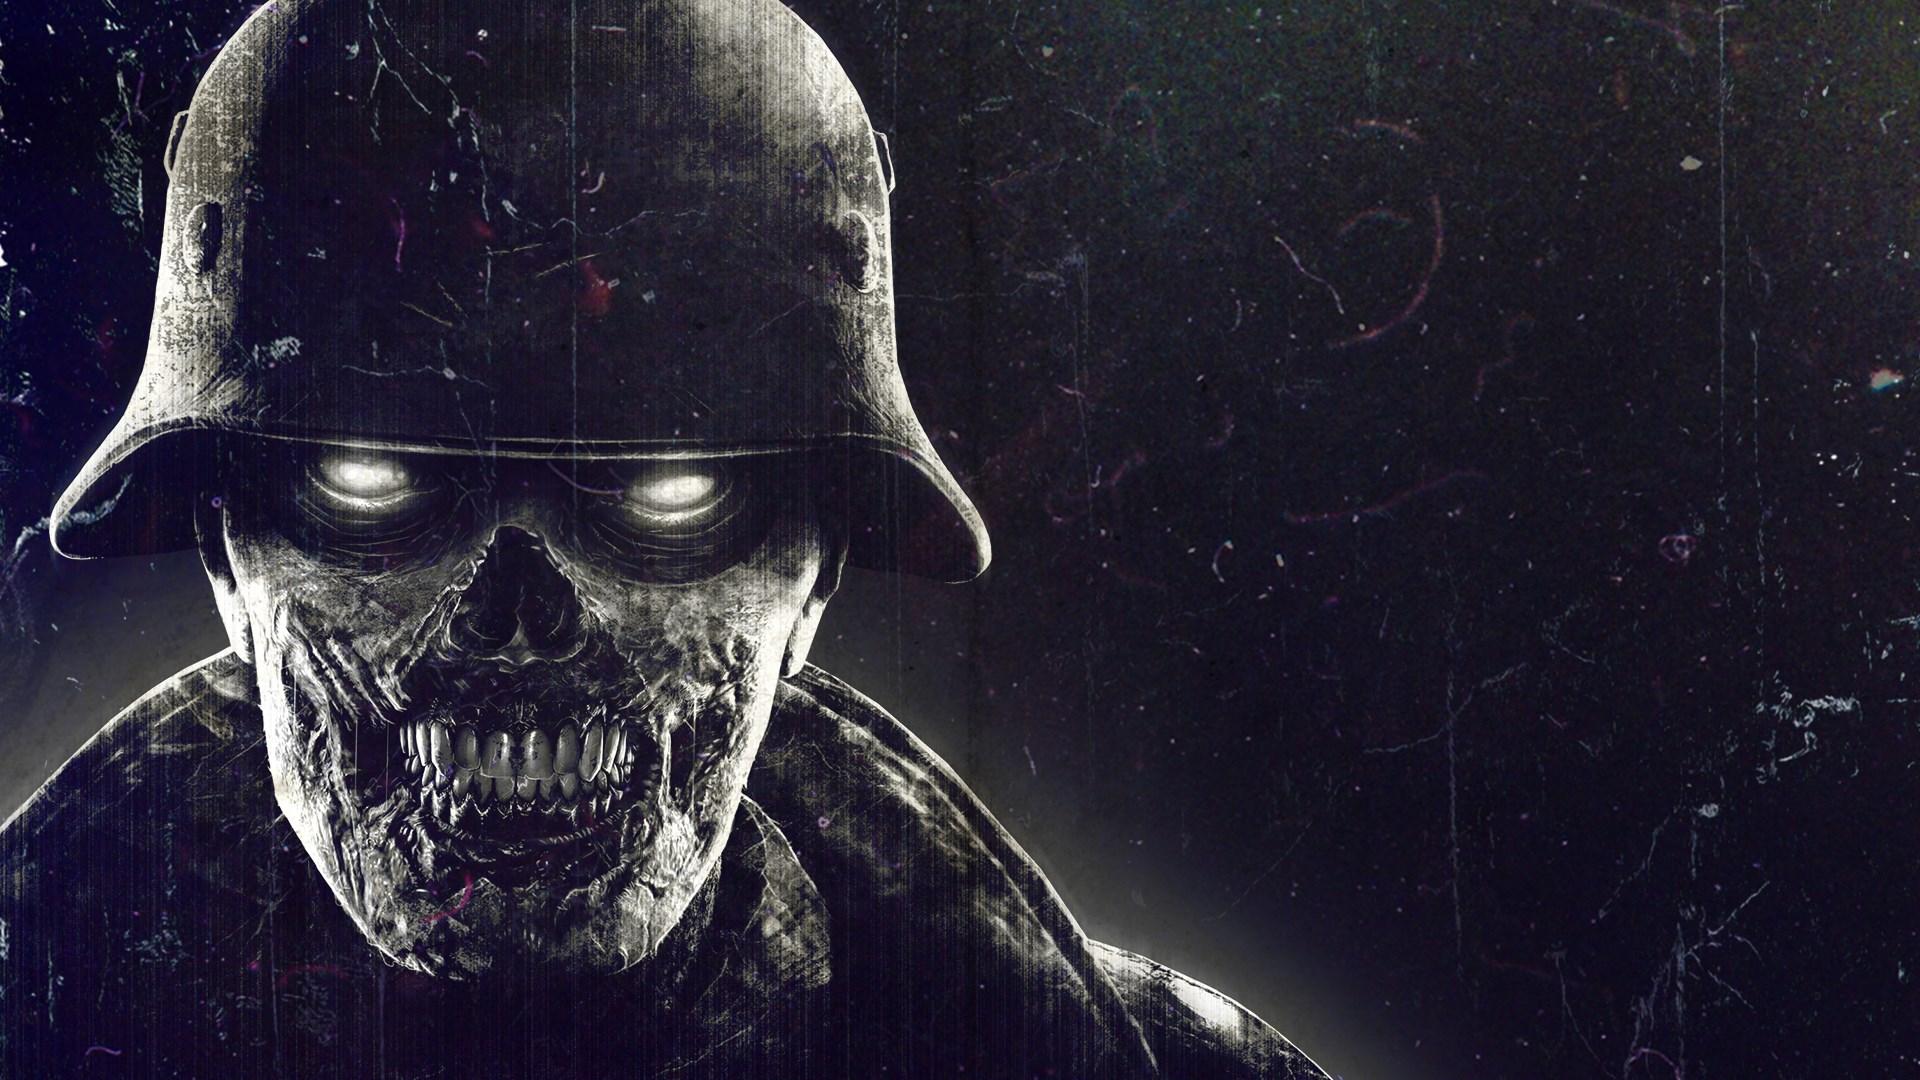 Zombie-Arme-Trilogie Matchmaking